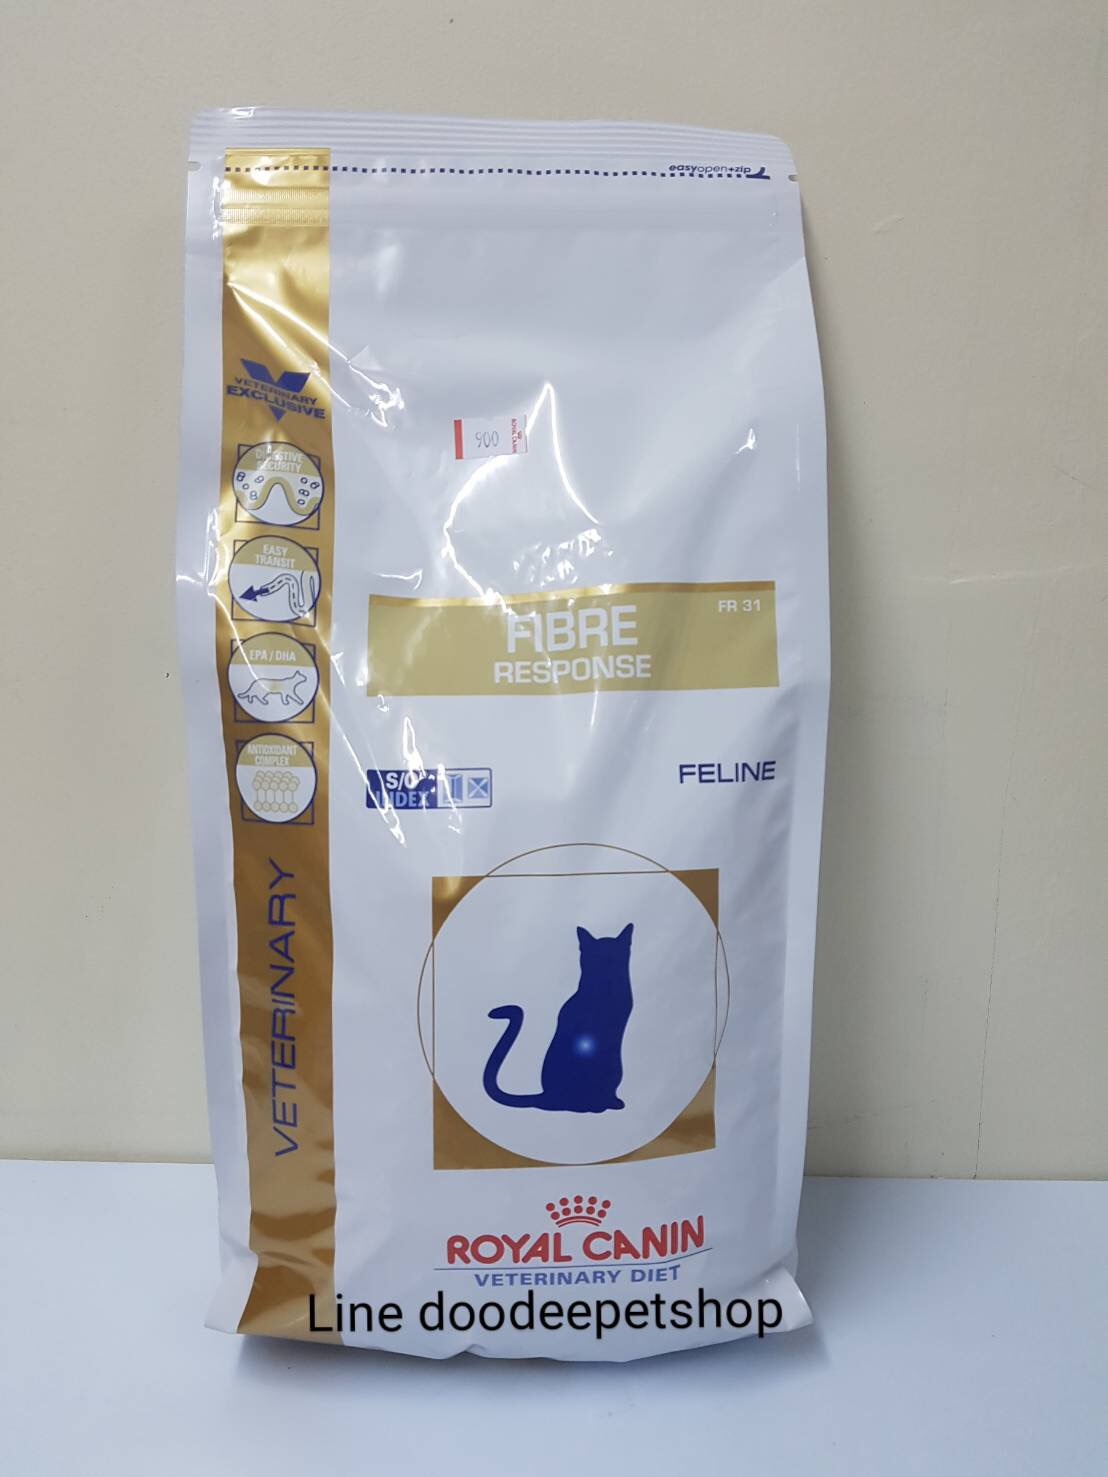 Fibre 2 kg.Exp.06/19 แมวโรคท้องผูก